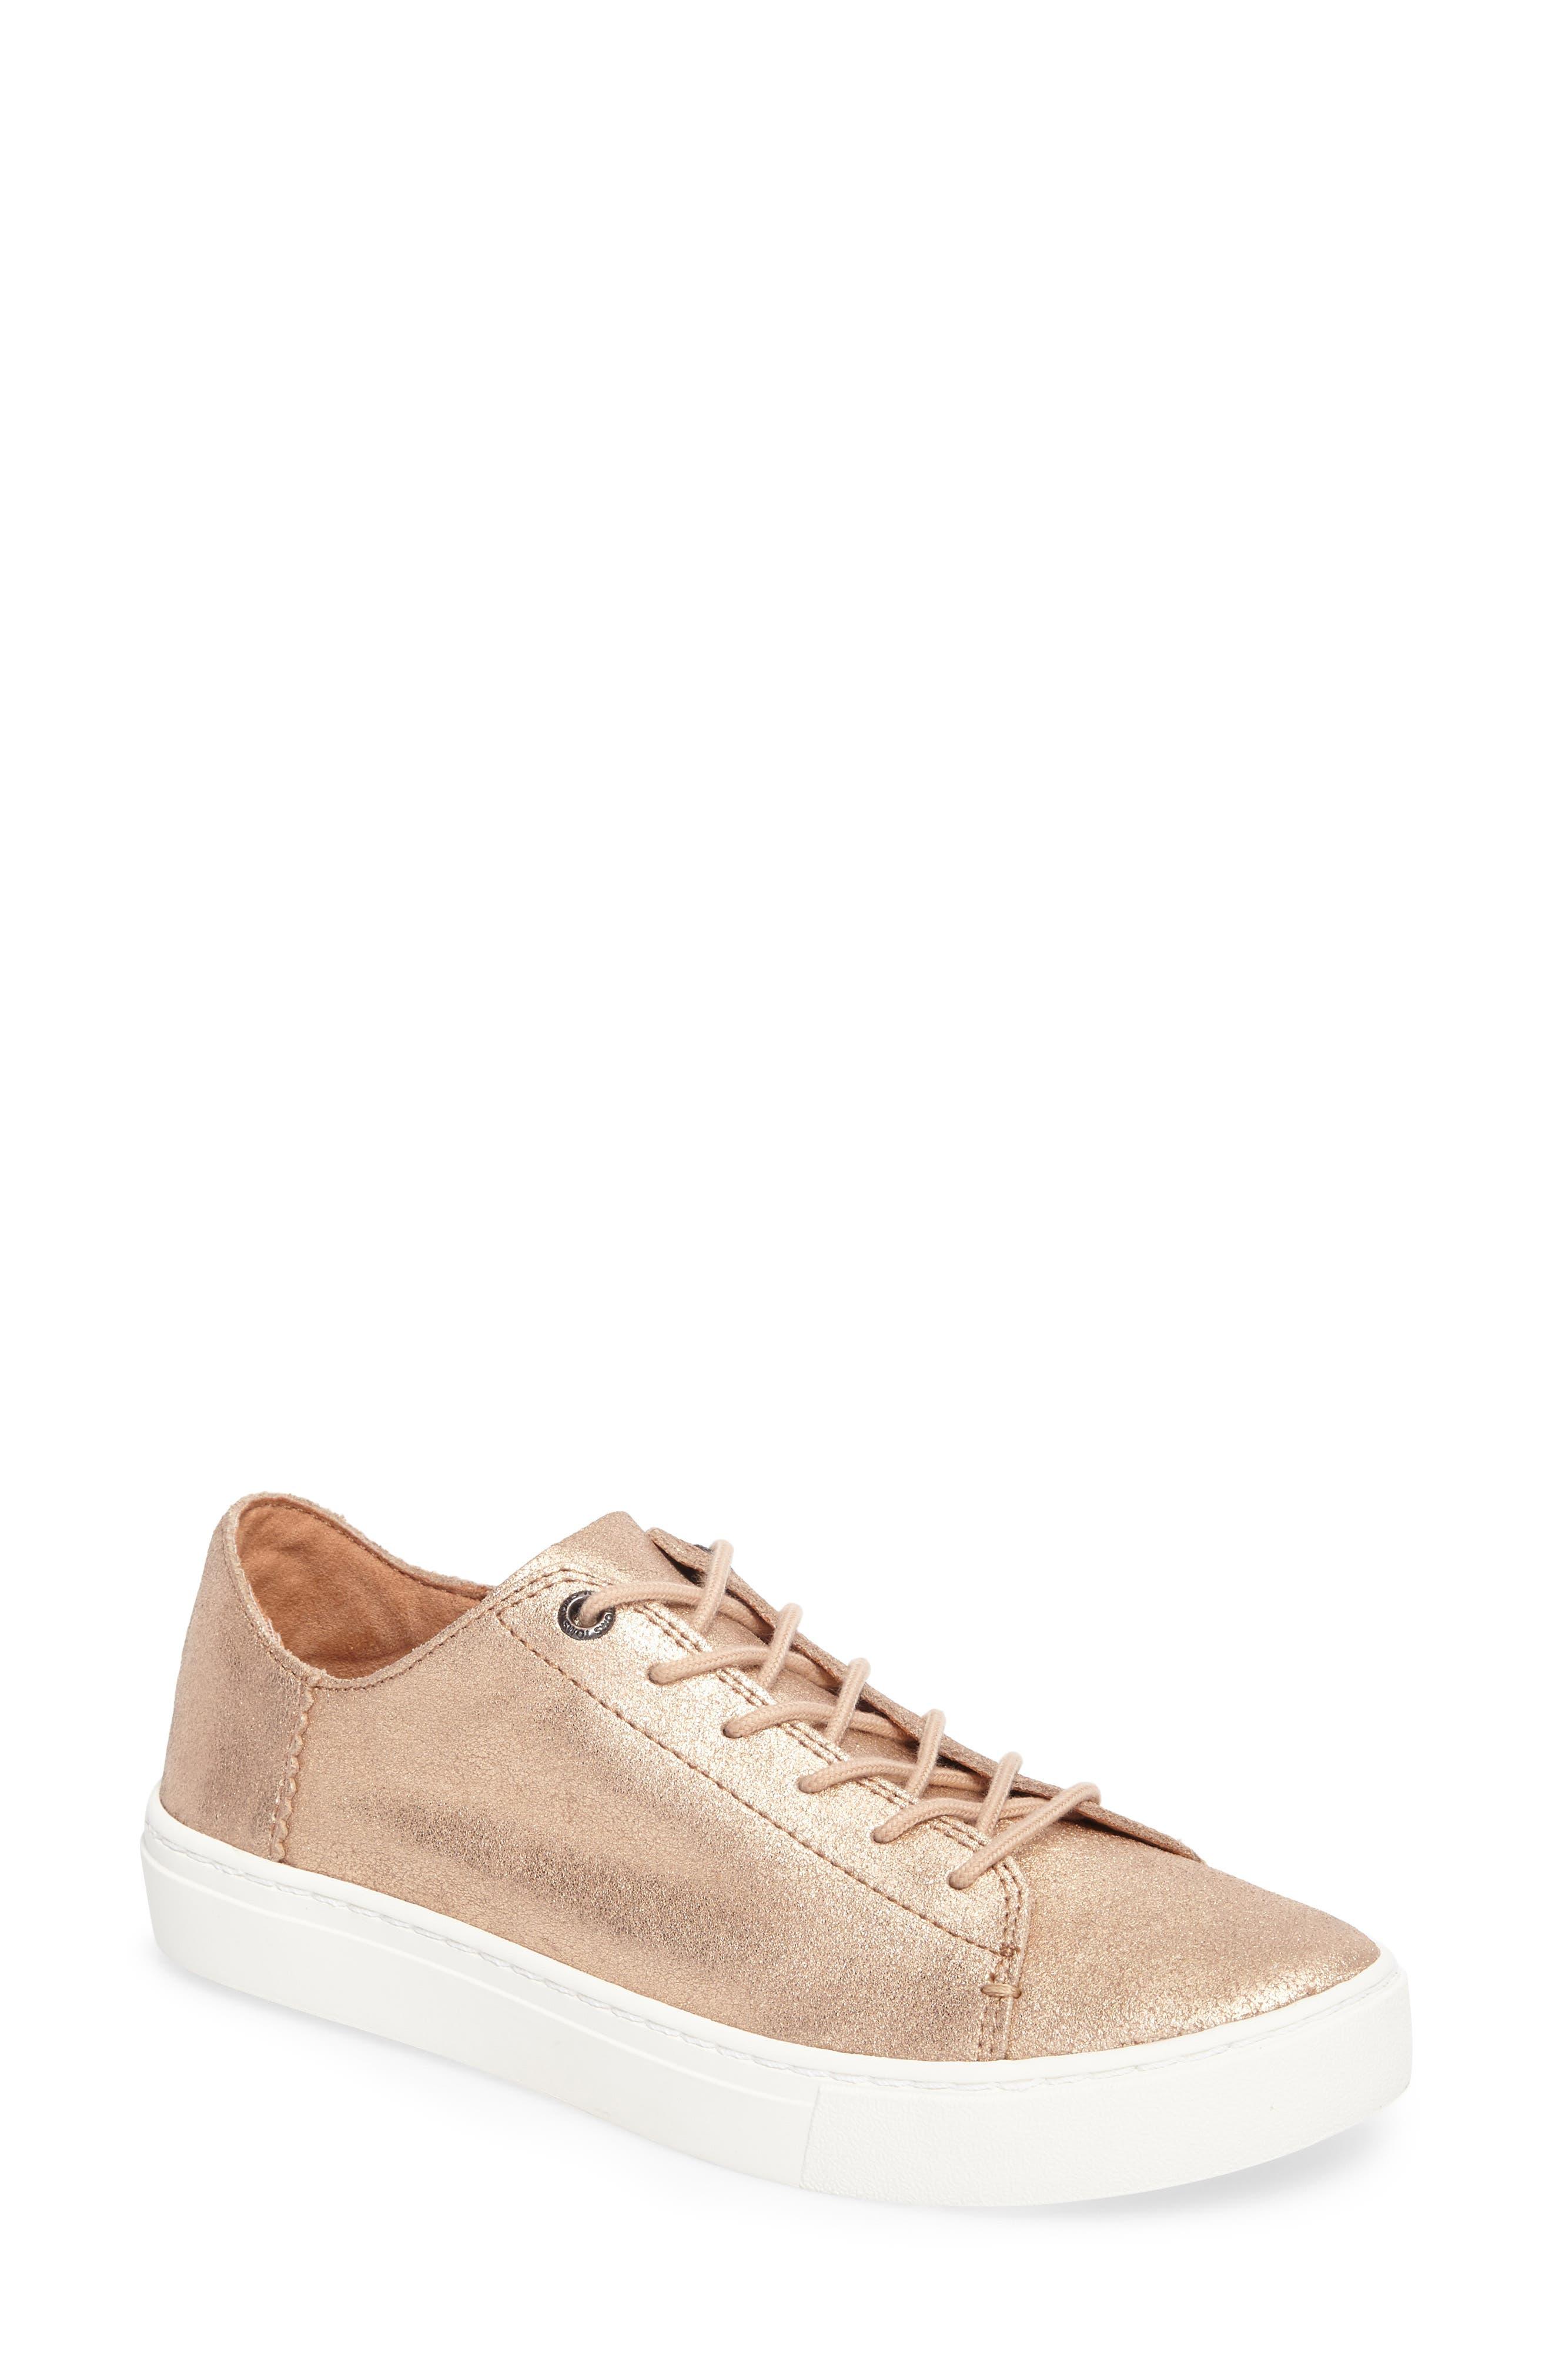 Main Image - TOMS Lenox Sneaker (Women)